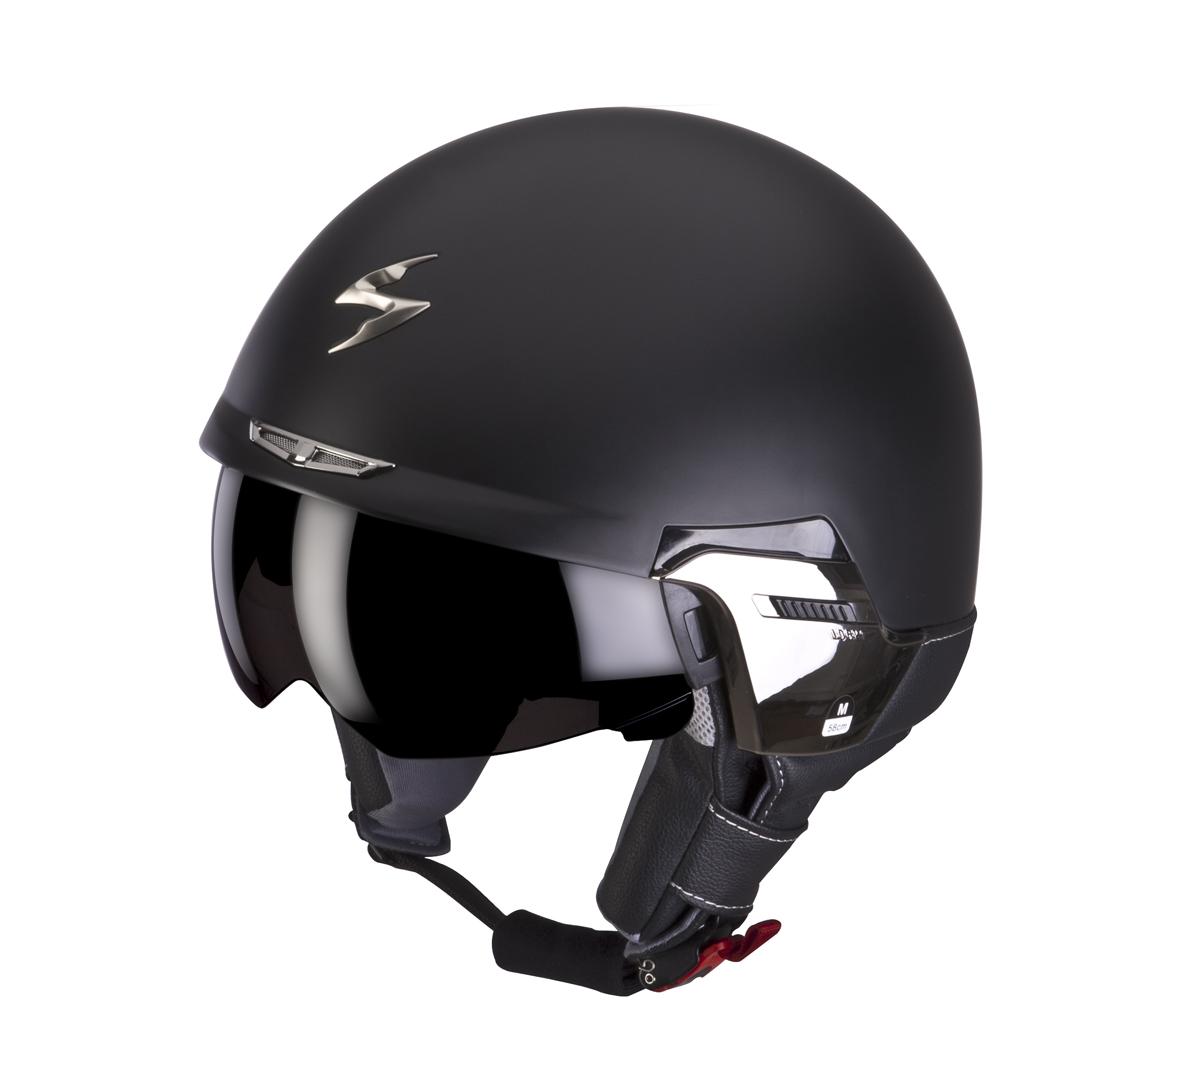 recenze helmy scorpion exo 100 padova motohodnocen cz. Black Bedroom Furniture Sets. Home Design Ideas